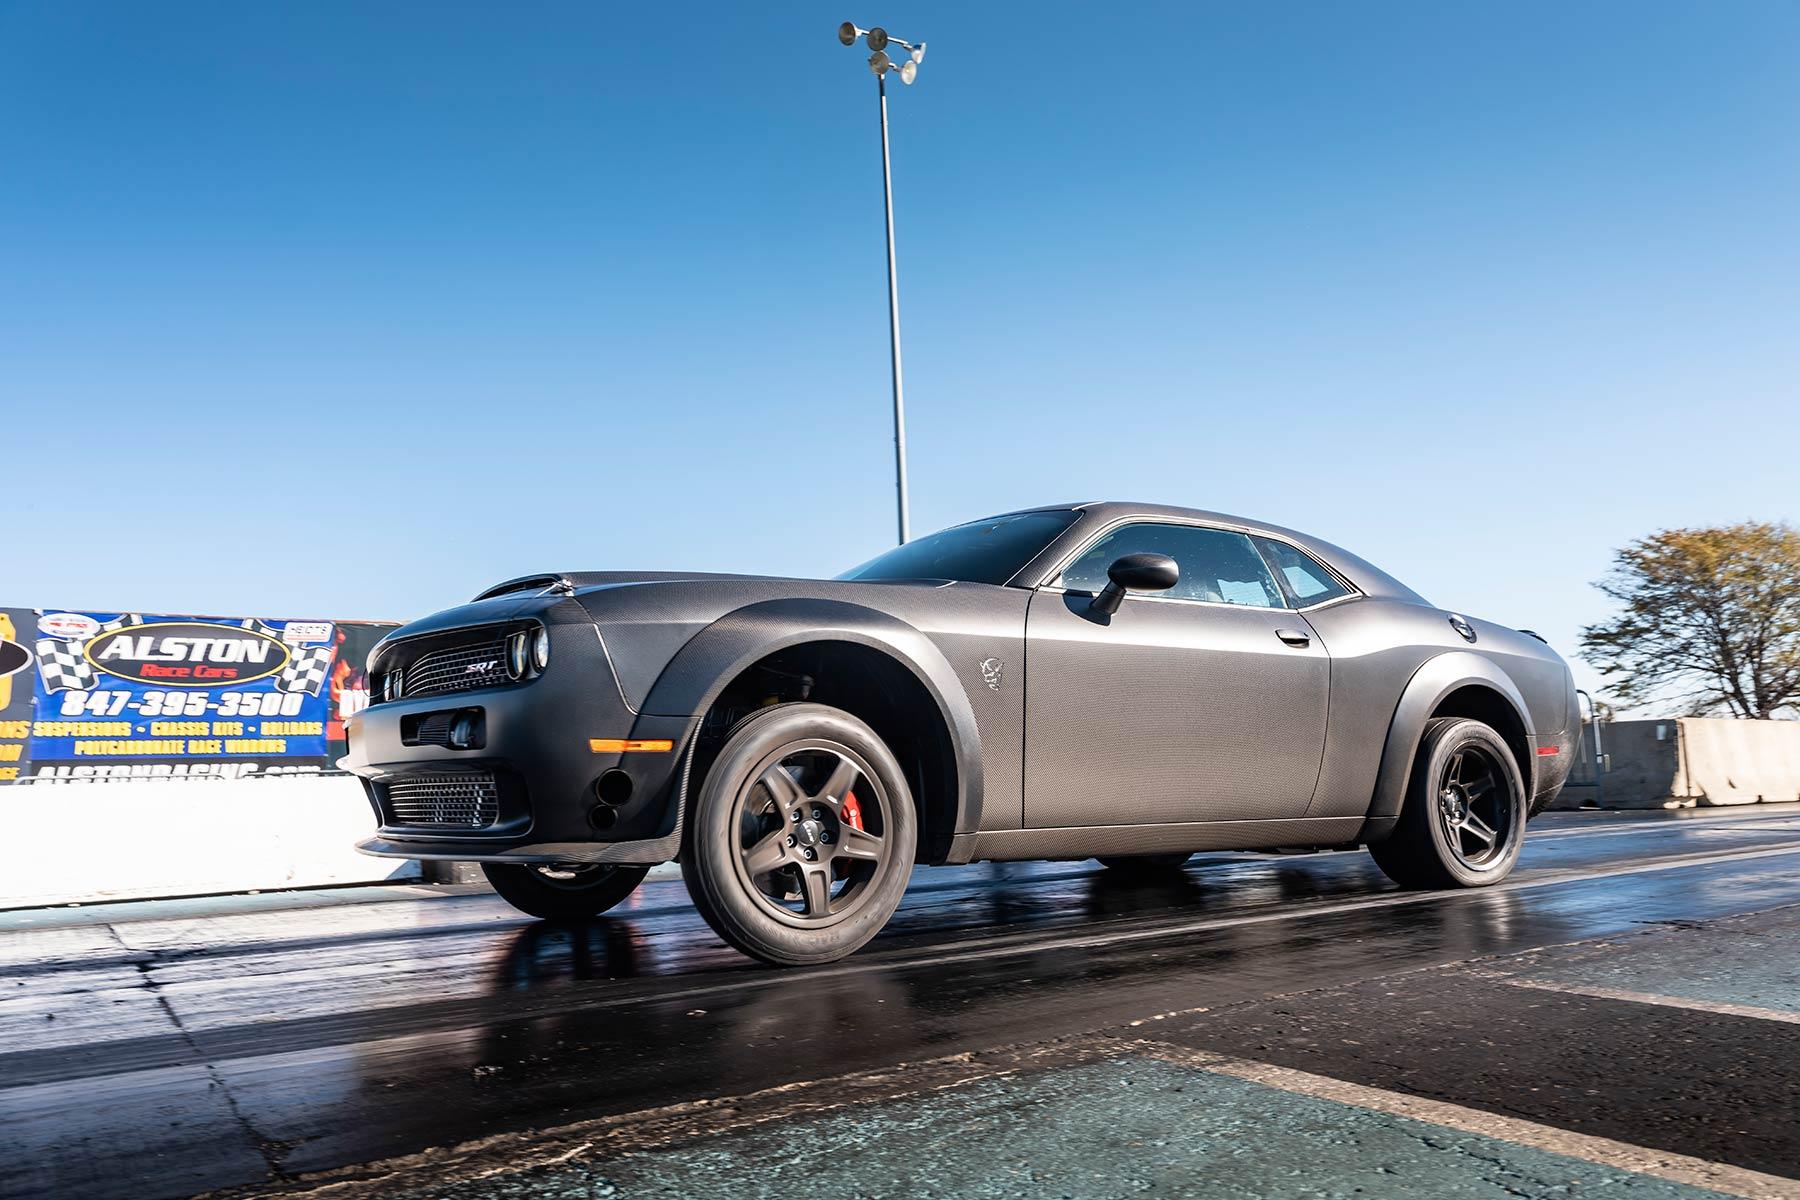 Dodge_Challenger_Demon_SpeedKore_0002